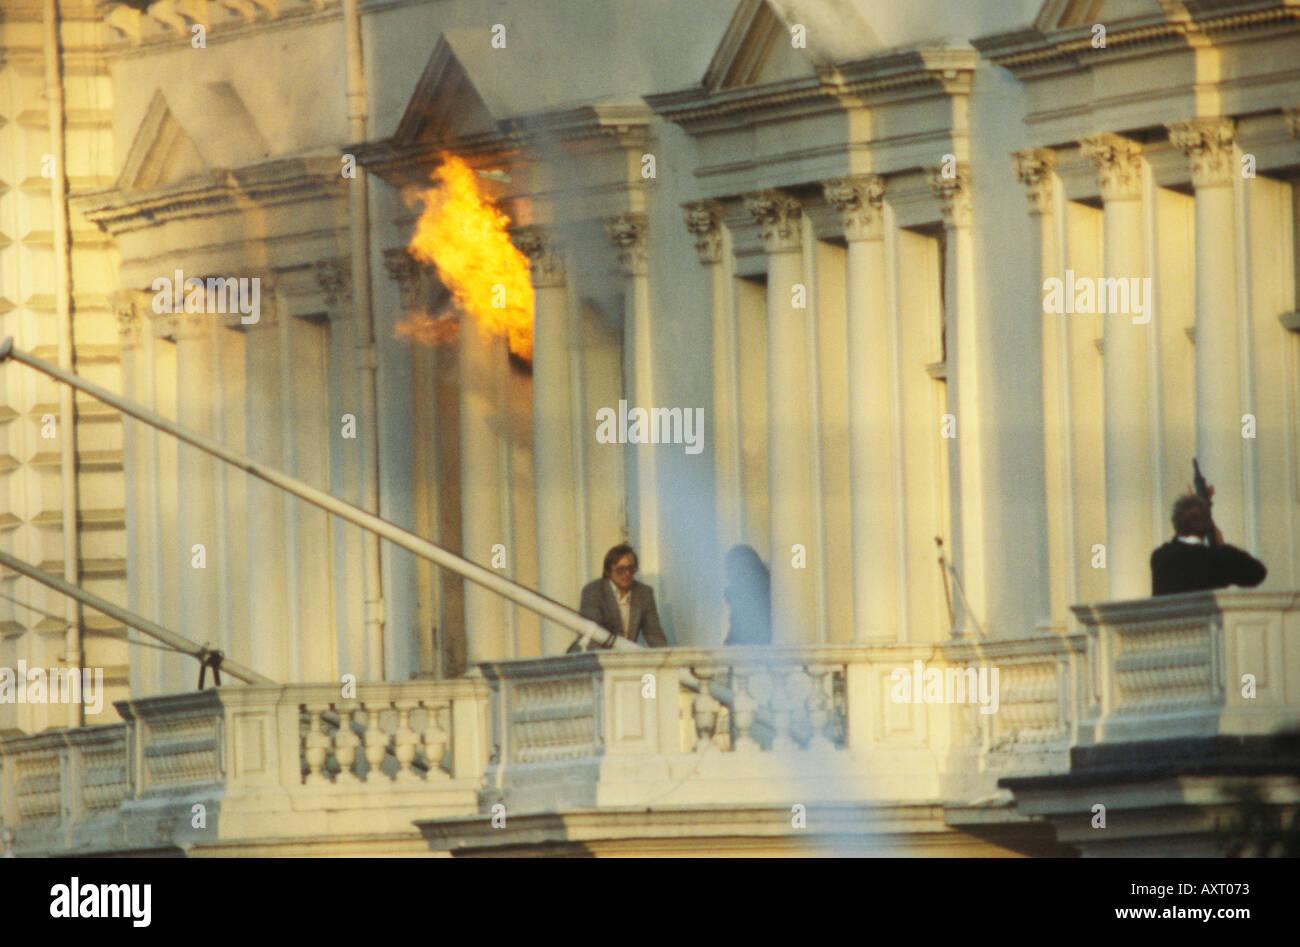 Iranische Botschaft Belagerung 5. Mai 1980 London UK 1980 s UK ca. 1985 HOMER SYKES Stockfoto